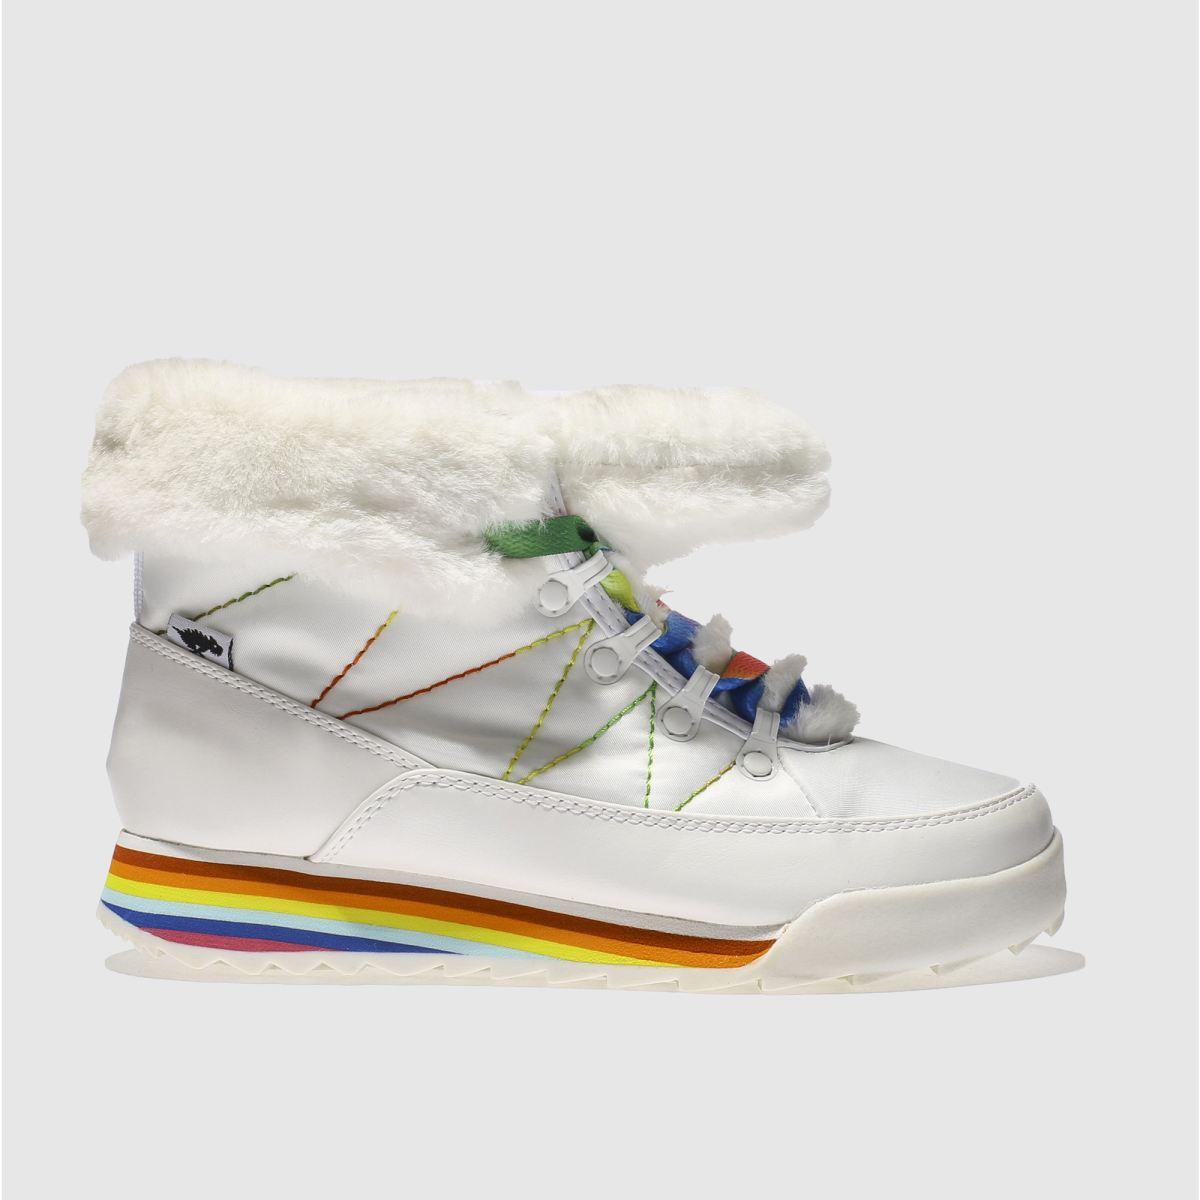 Rocket Dog White Icee Icecap Boots